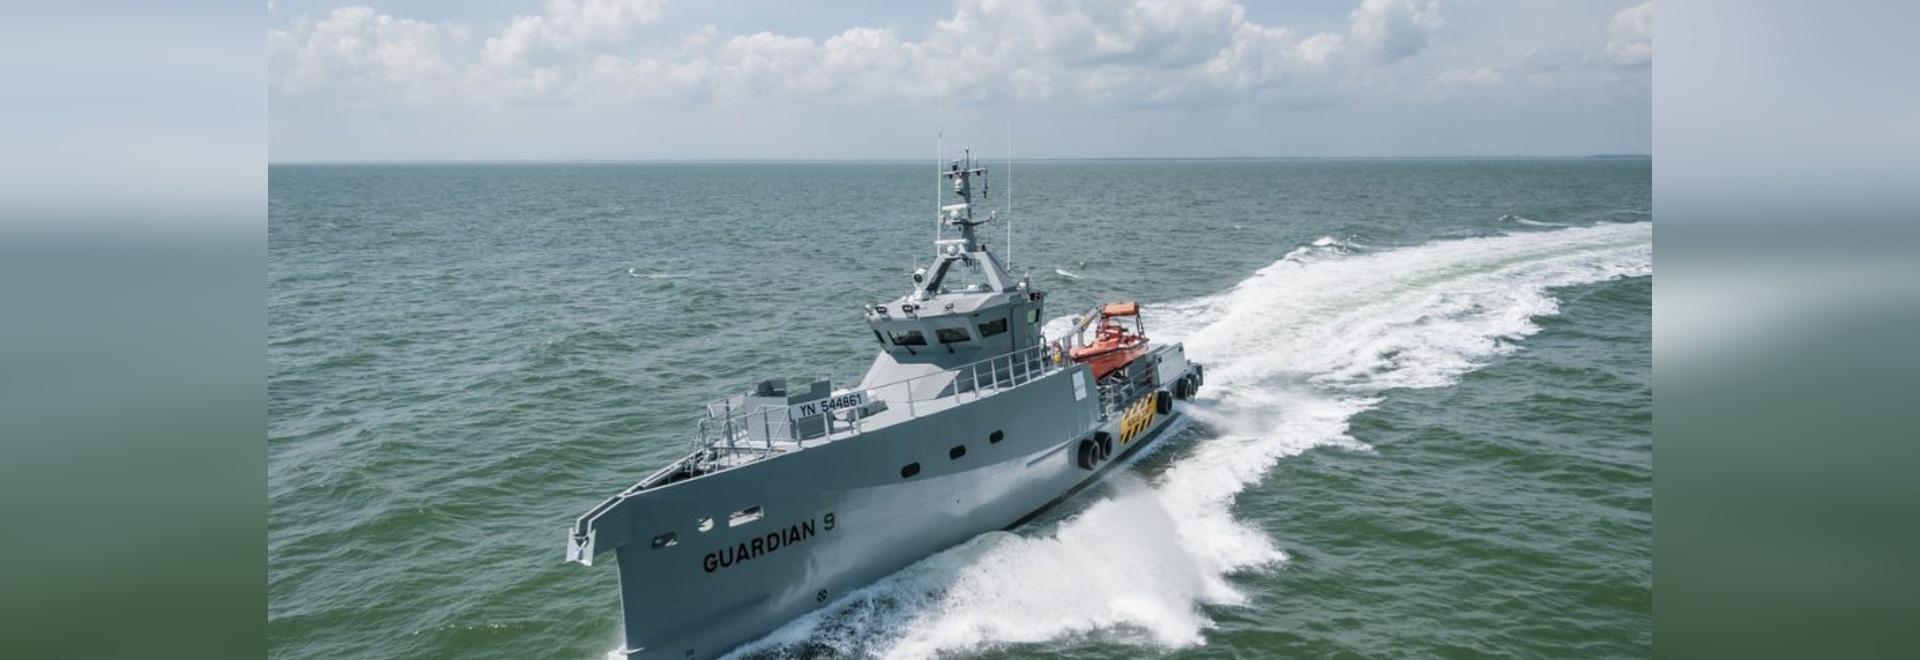 Damen FCS 3307 Patrol vessel Guardian 9_lowres